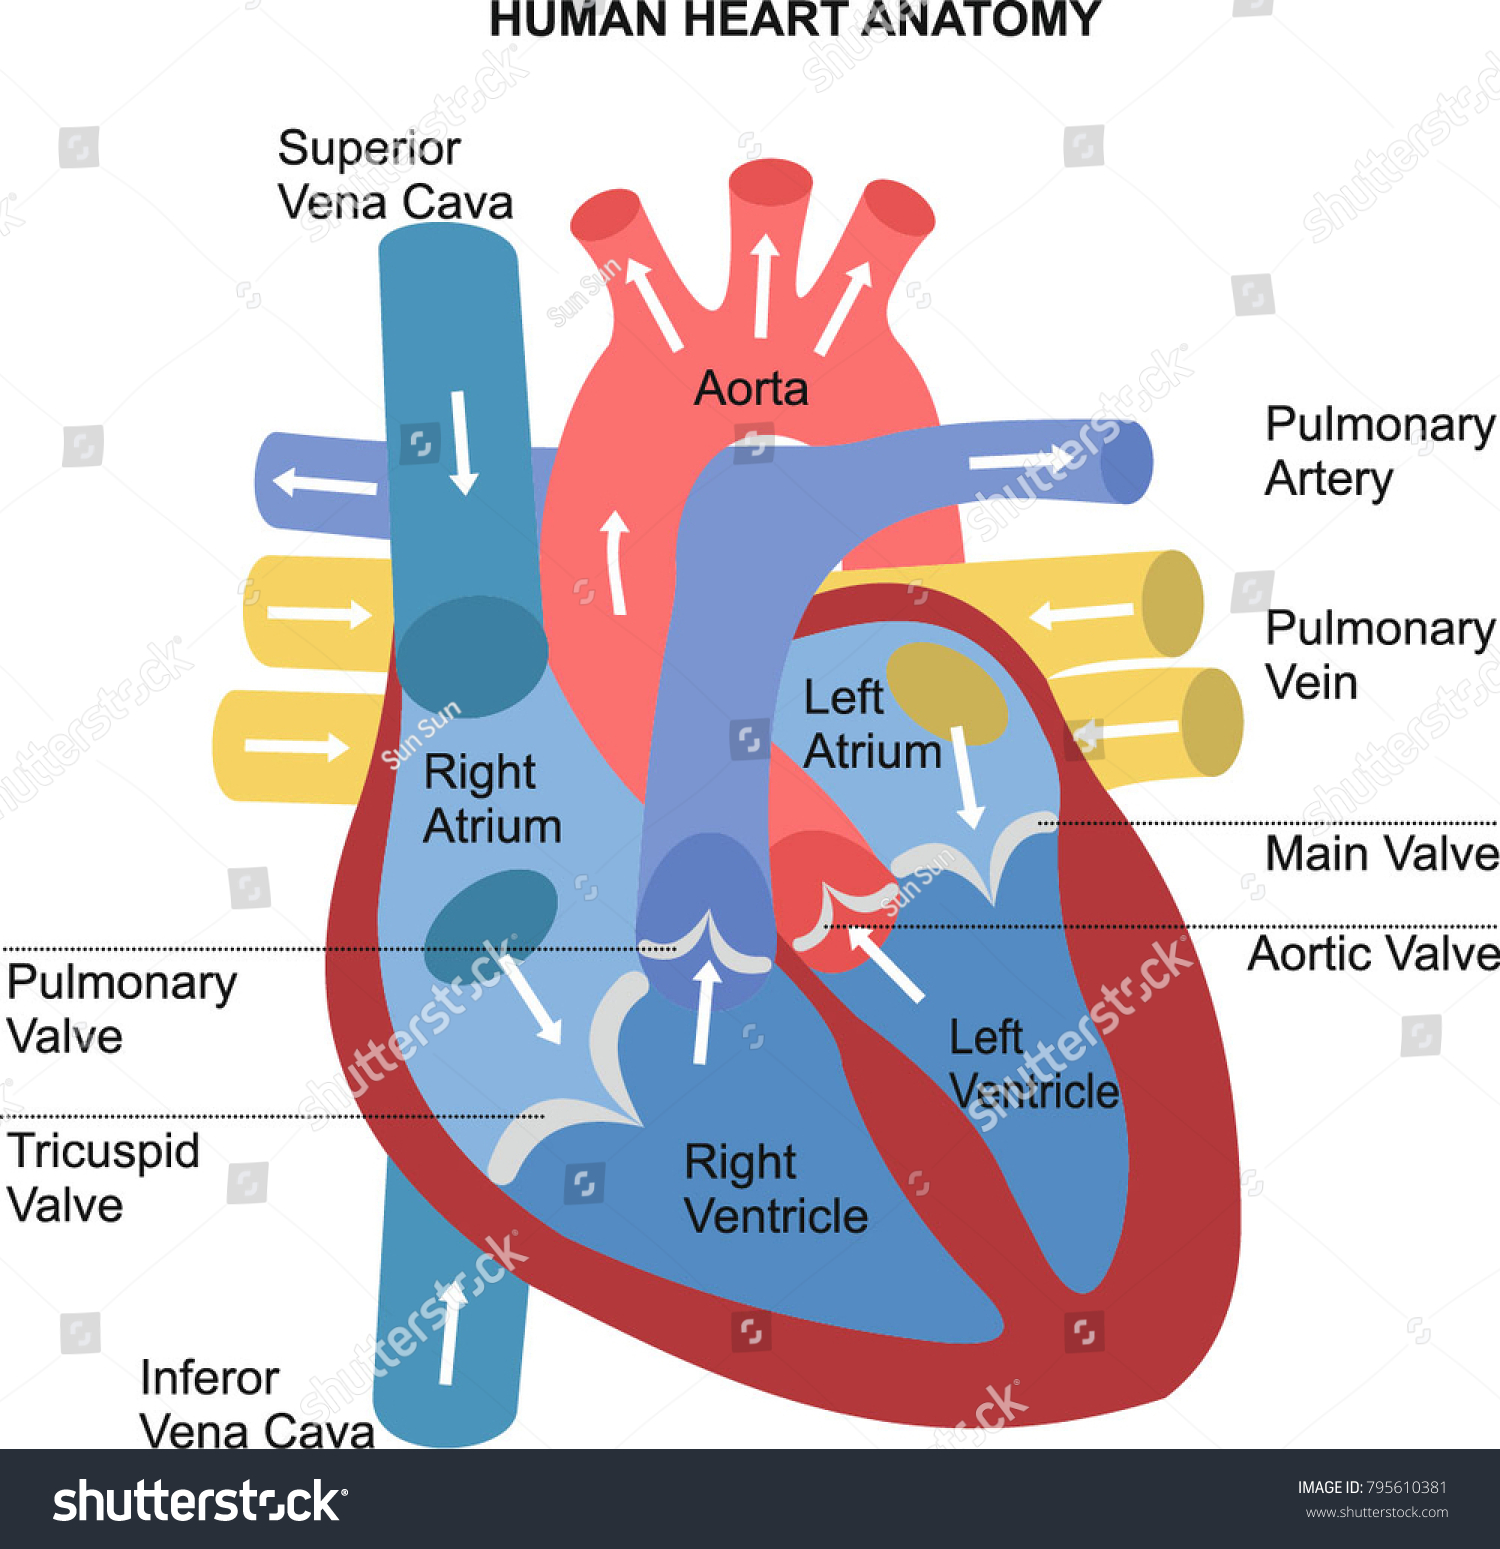 Human Heart Anatomy Diagram Stock Vector 795610381 - Shutterstock